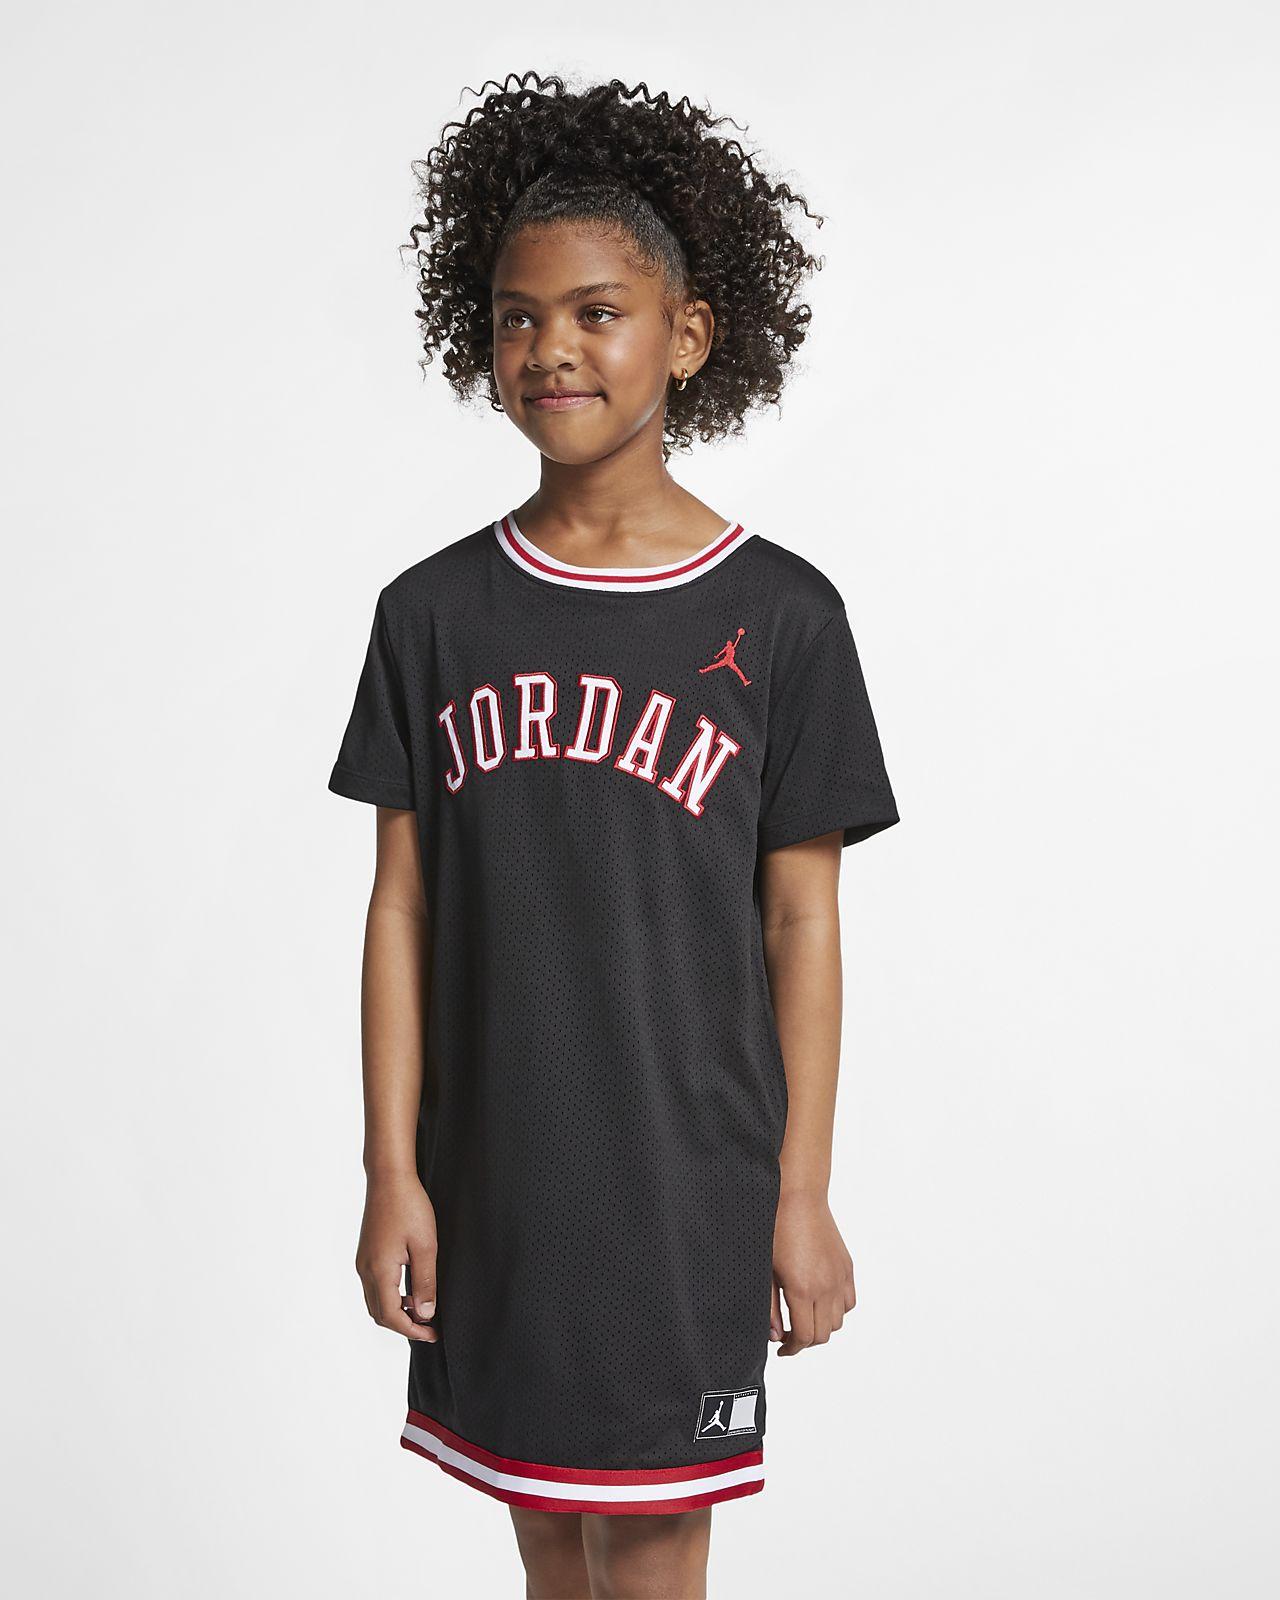 Jordan Vestit - Nena